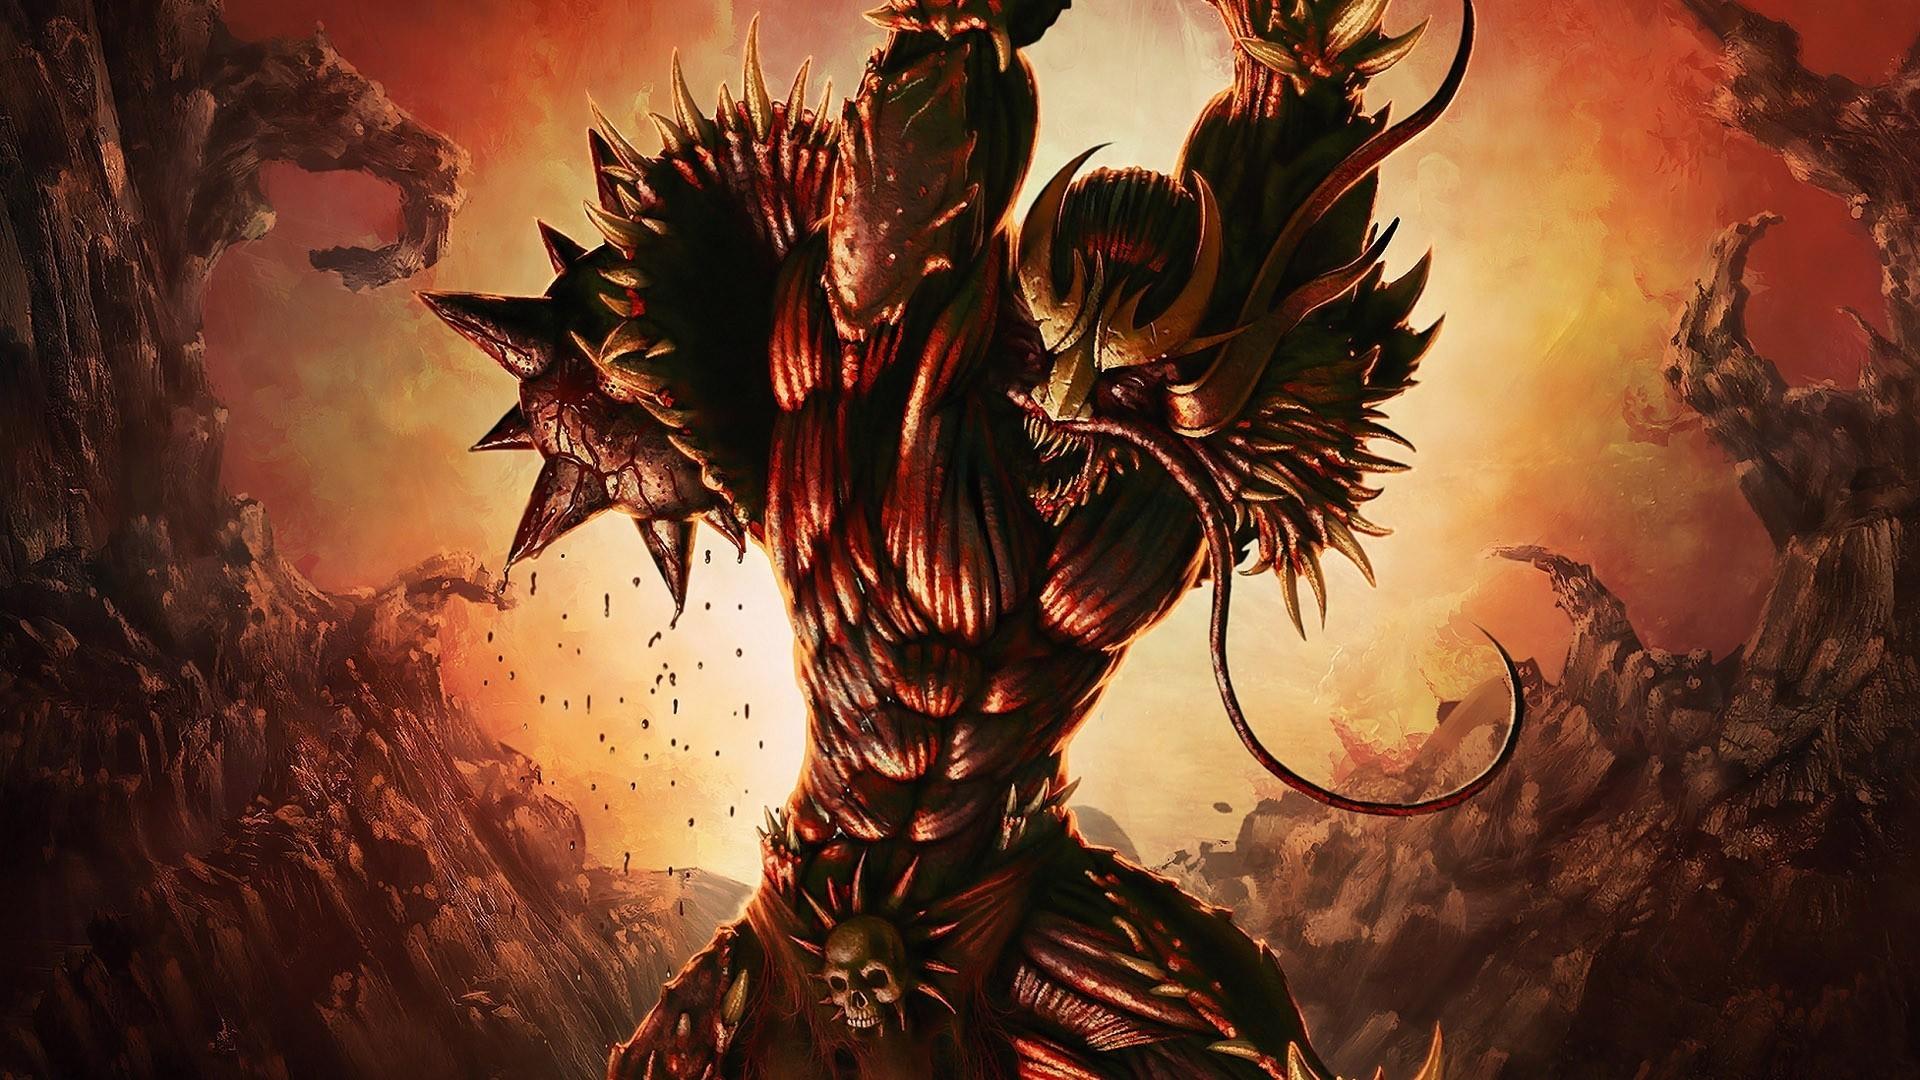 Spikey Devil HD Phenomenal Wallpaper Free - Download Spikey Devil